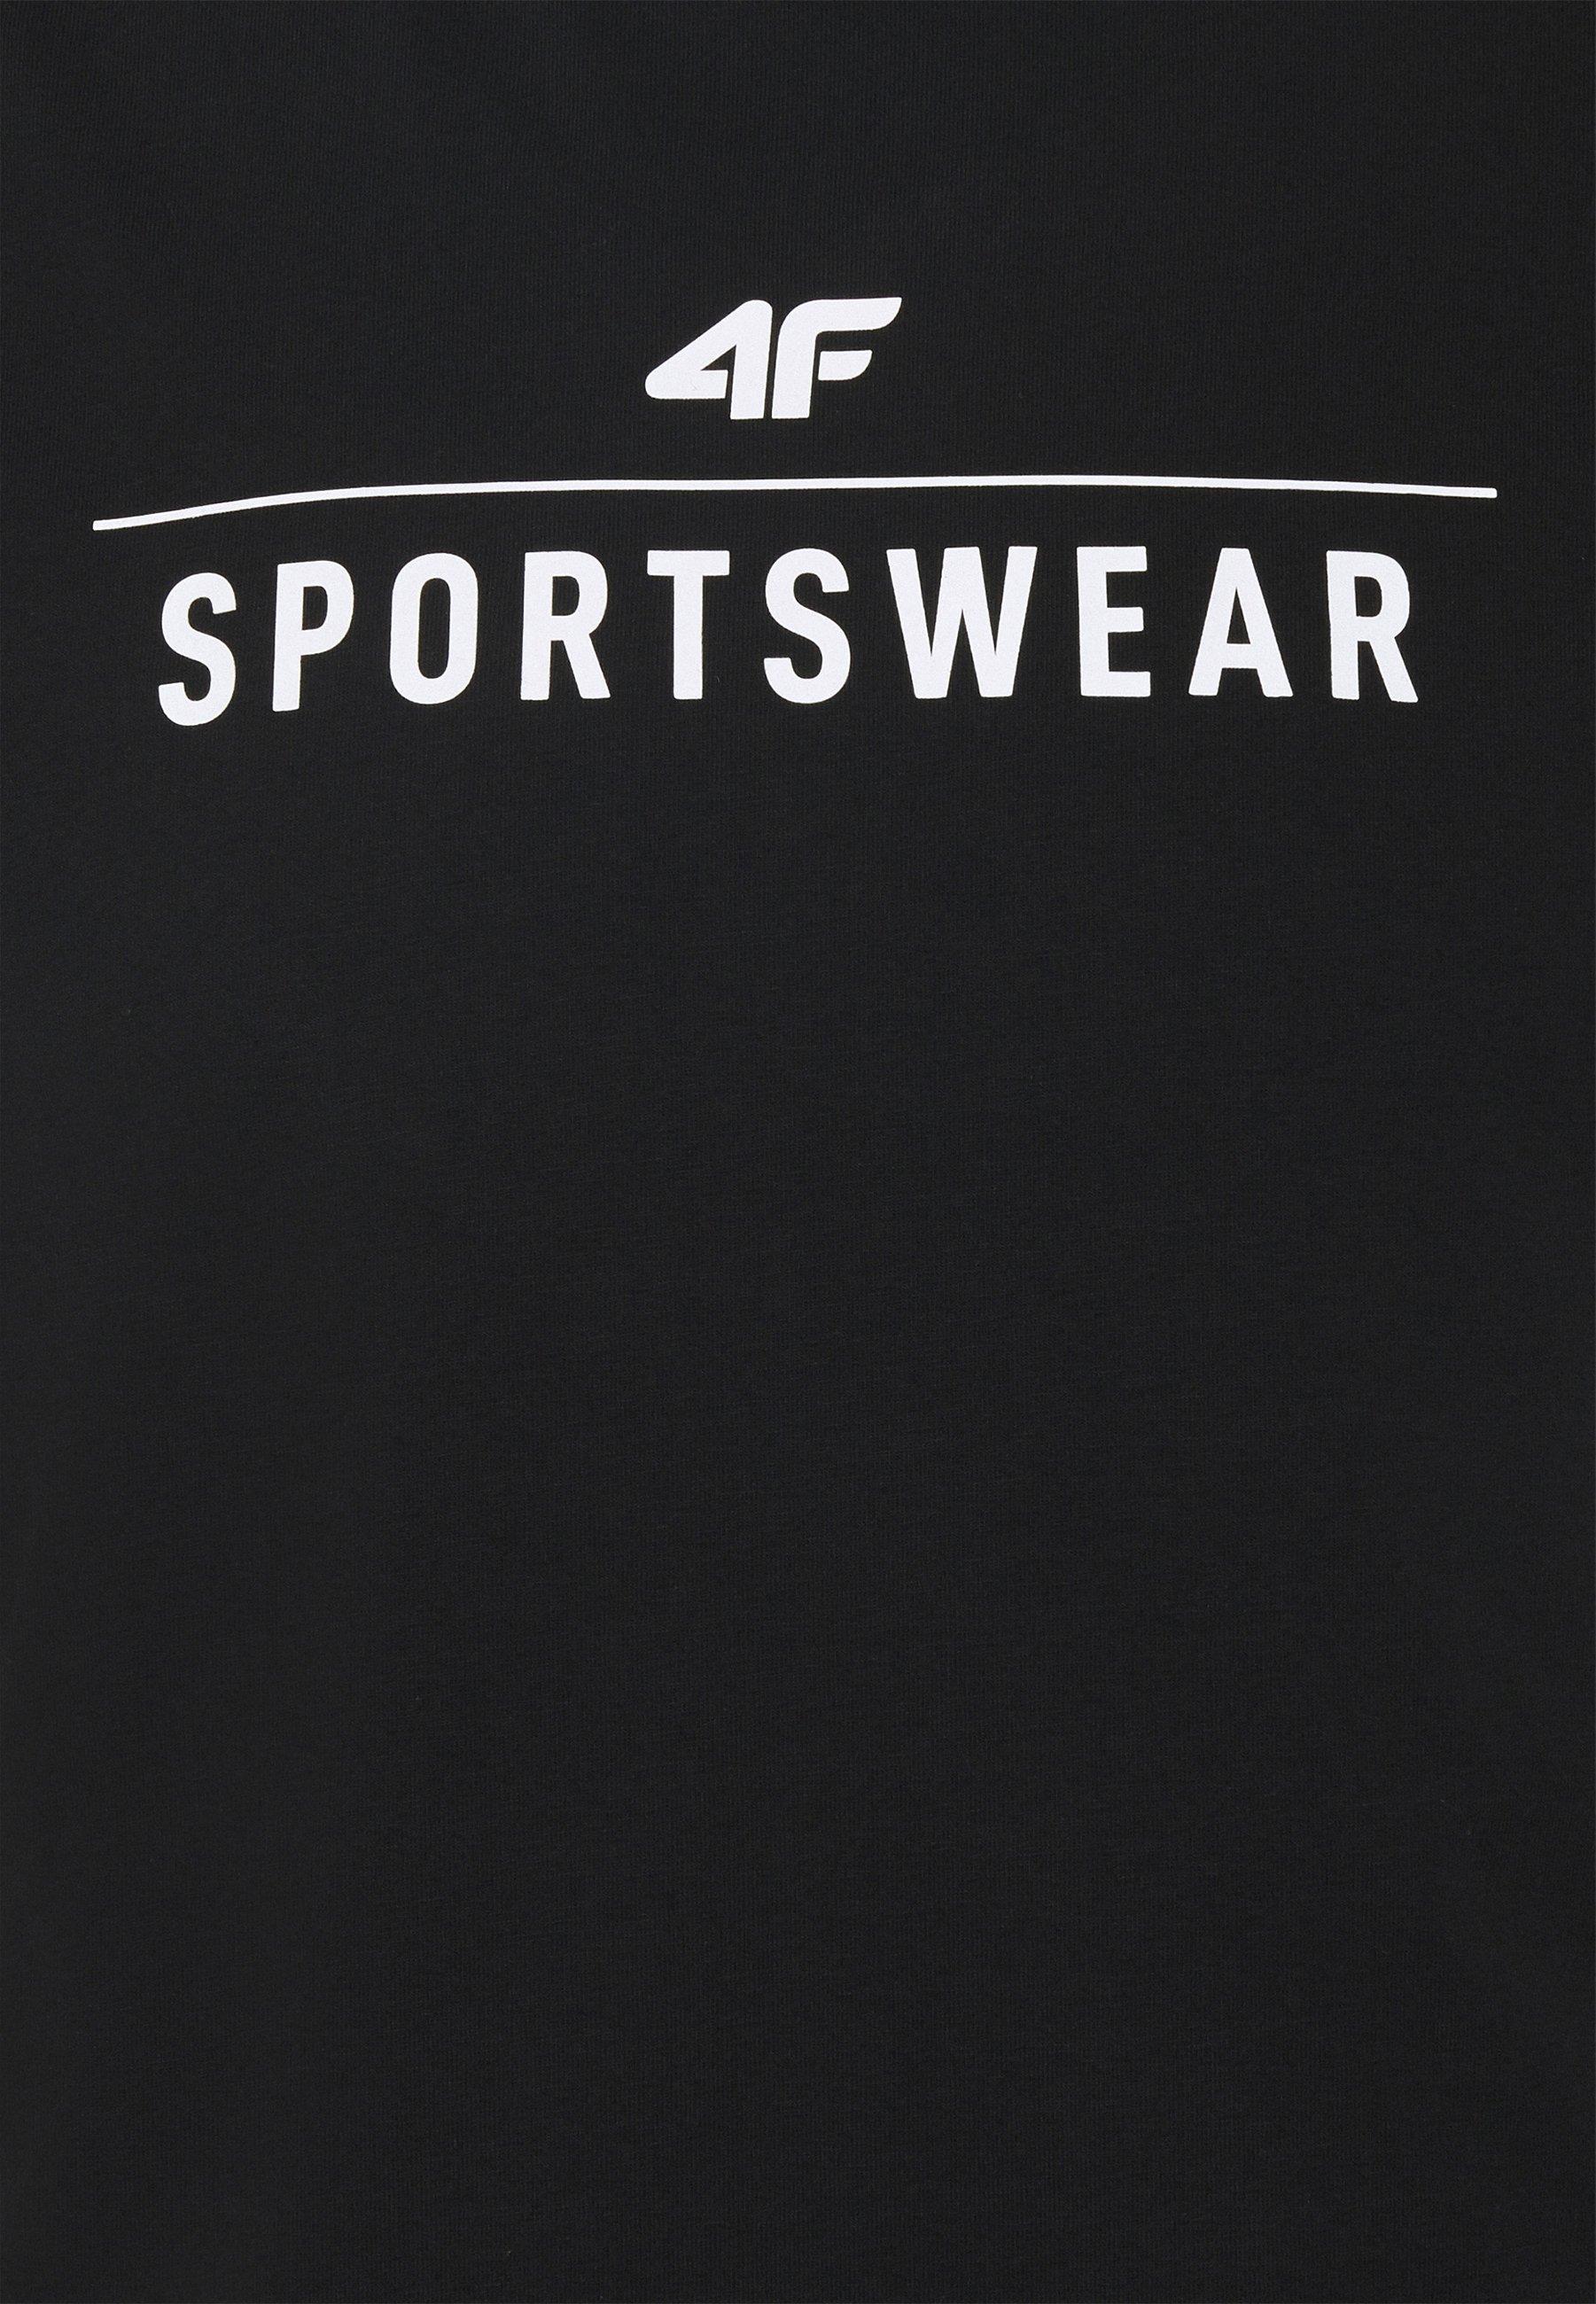 Men Men's T-shirt - Print T-shirt